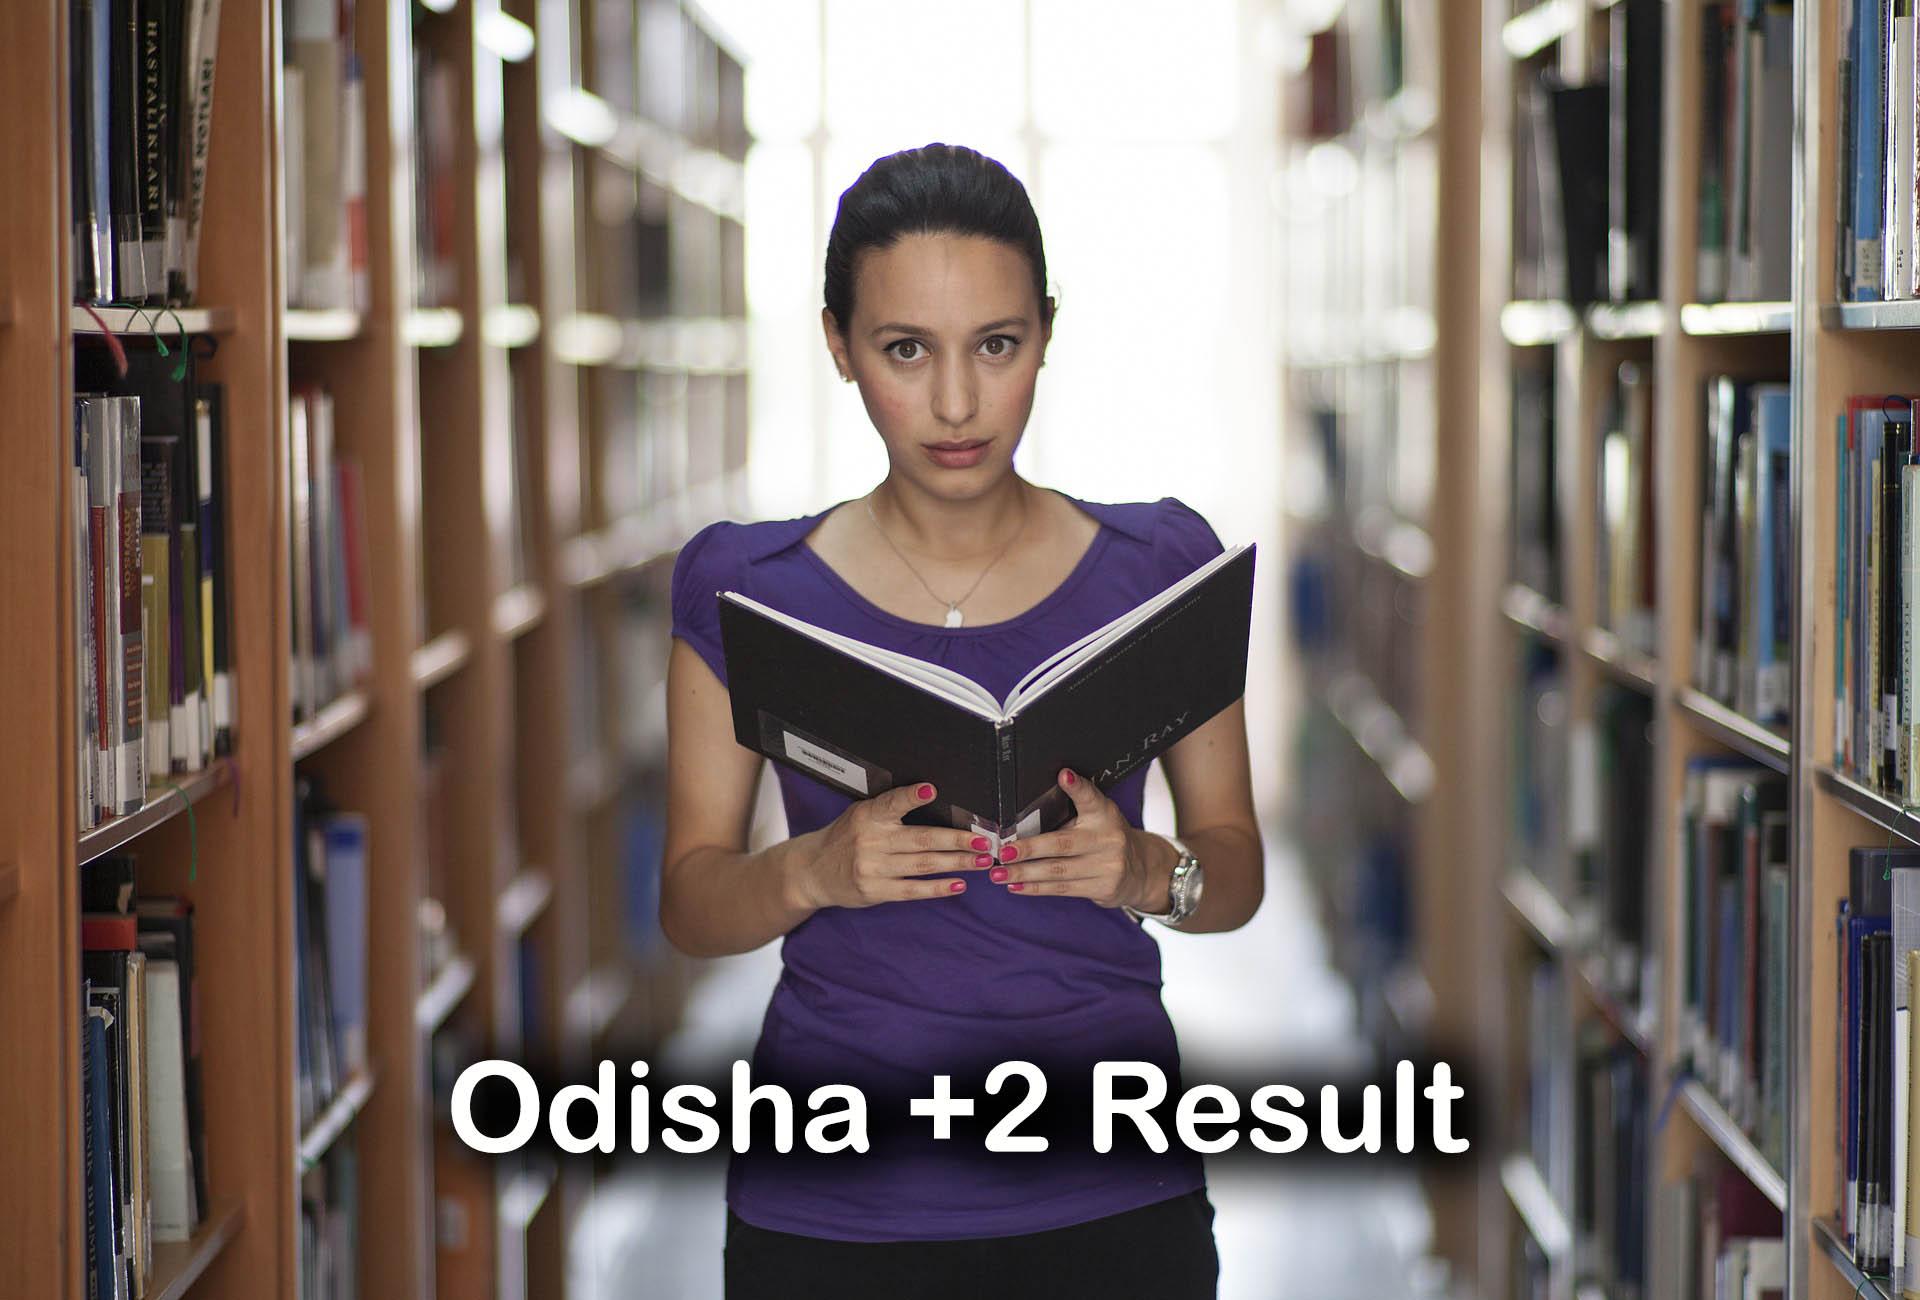 CHSE Odisha +2 Result 2020 : Odisha Board 12th Result 2020